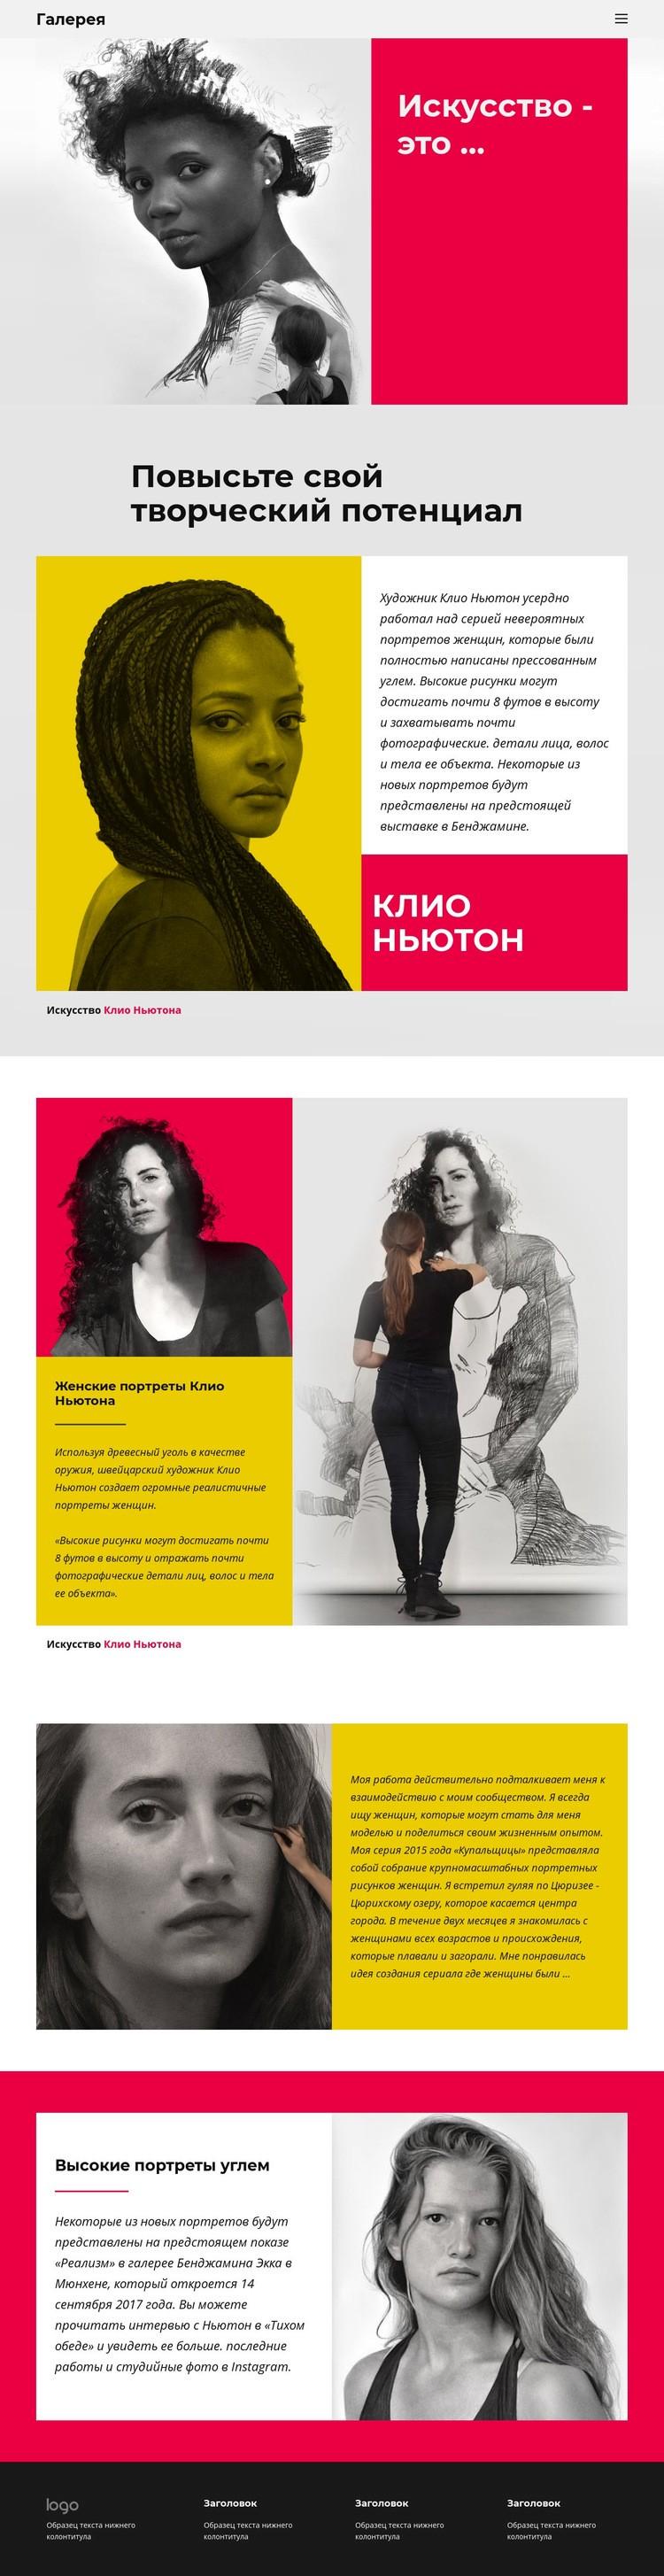 Портреты Углем Шаблон веб-сайта